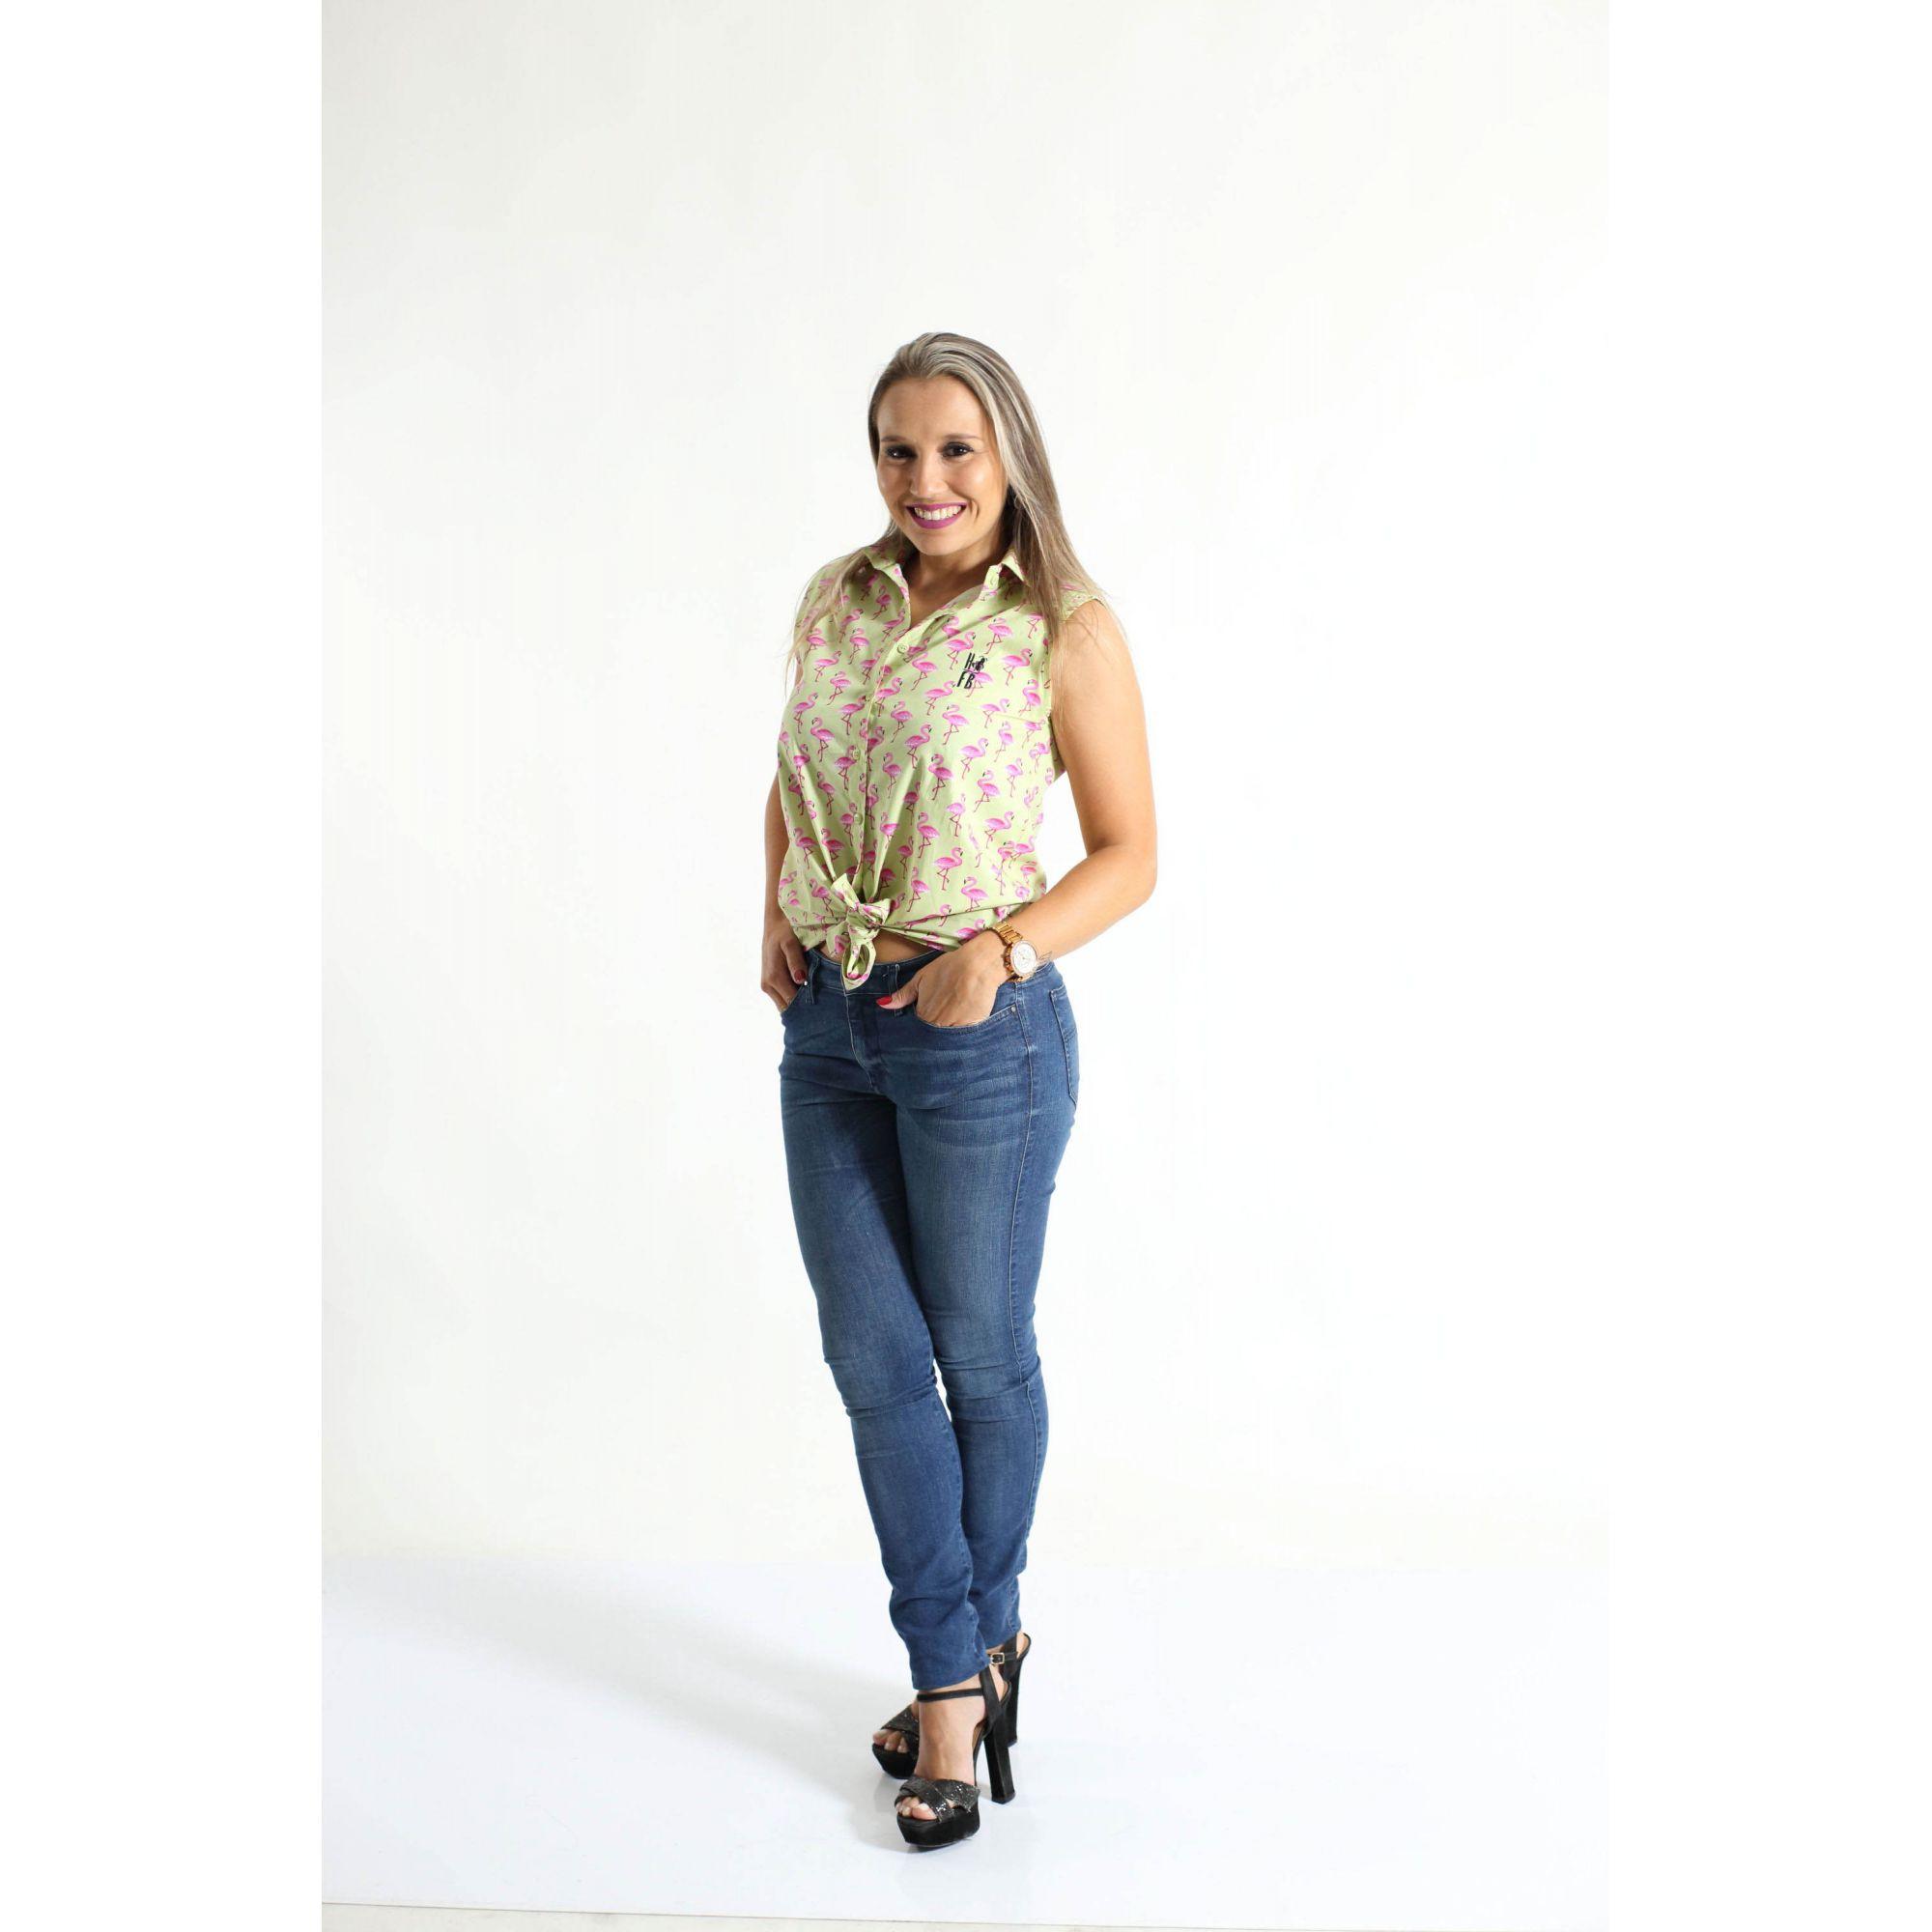 MÃE E FILHO > Kit 02 Camisas Social Adulto e Infantil Flamingos [Coleção Tal Mãe Tal Filho]  - Heitor Fashion Brazil